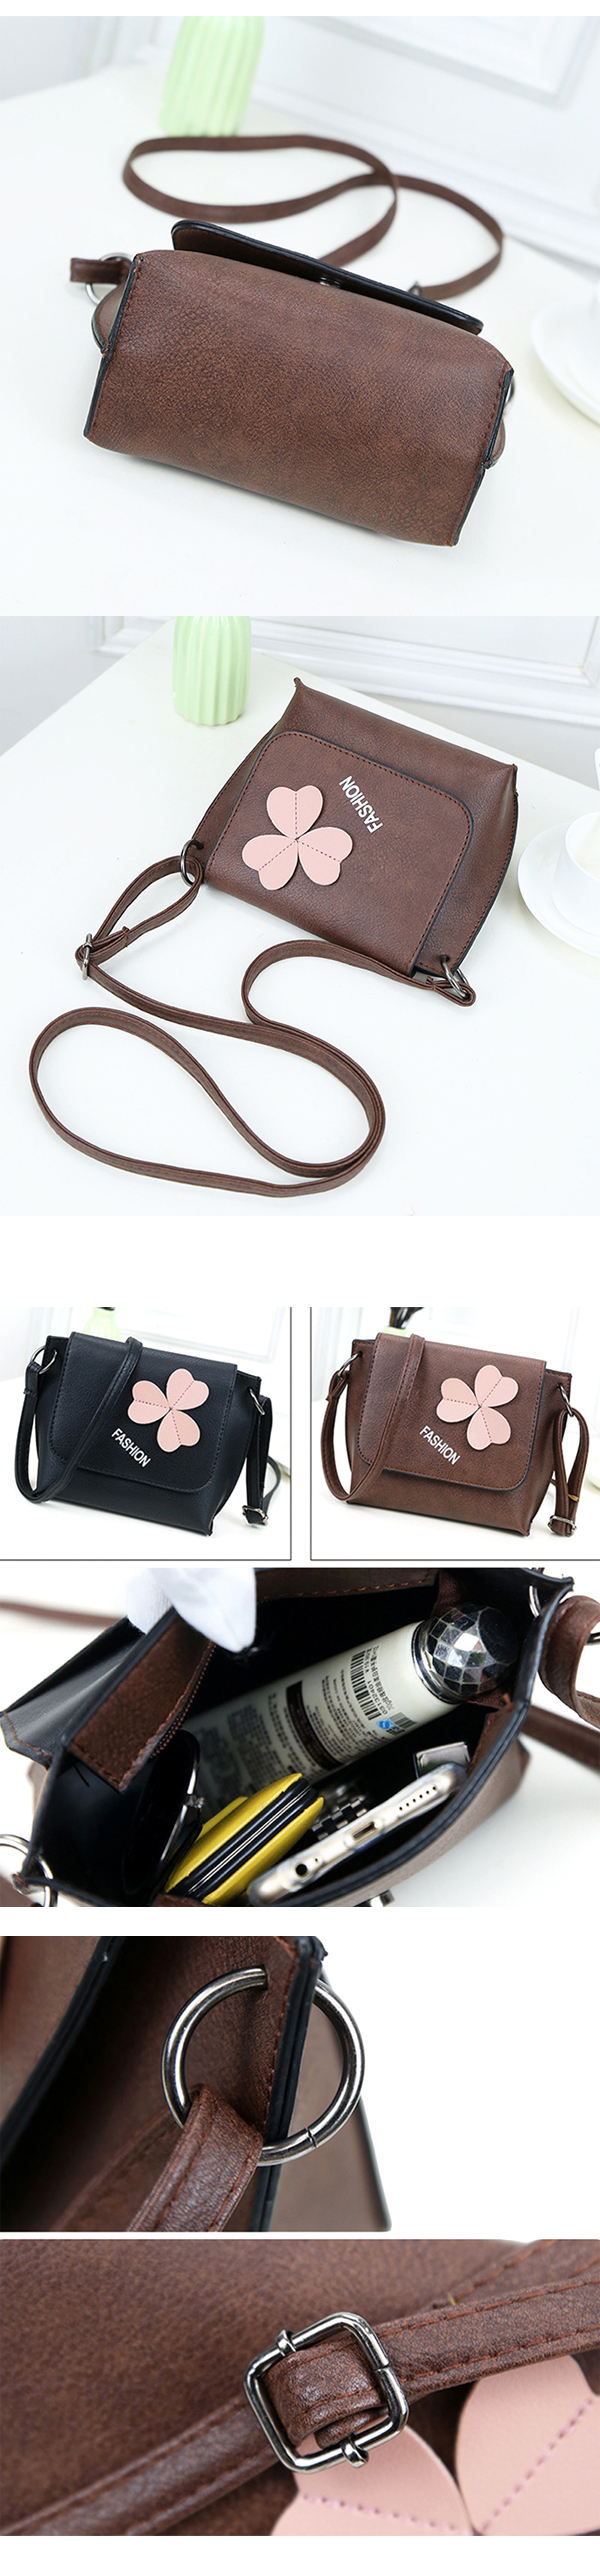 Women Stylish Flower Pattern Decorational Shoulder Bag